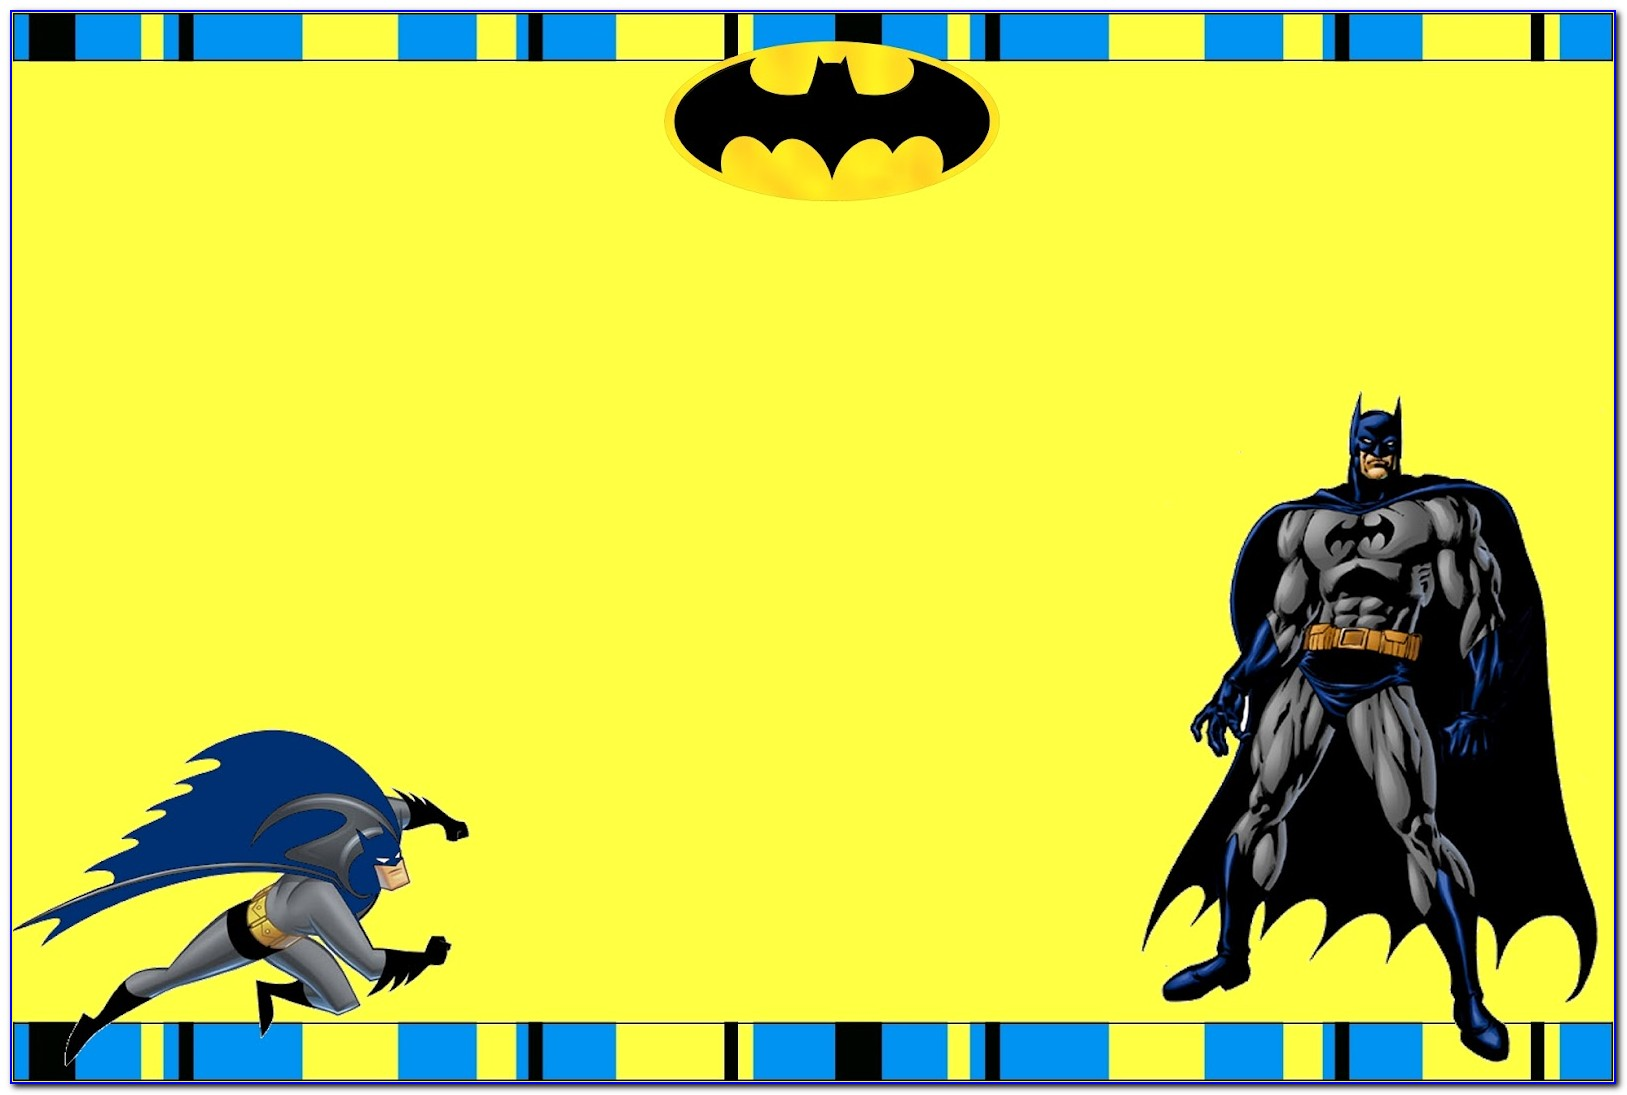 Batman Invitation Card Template